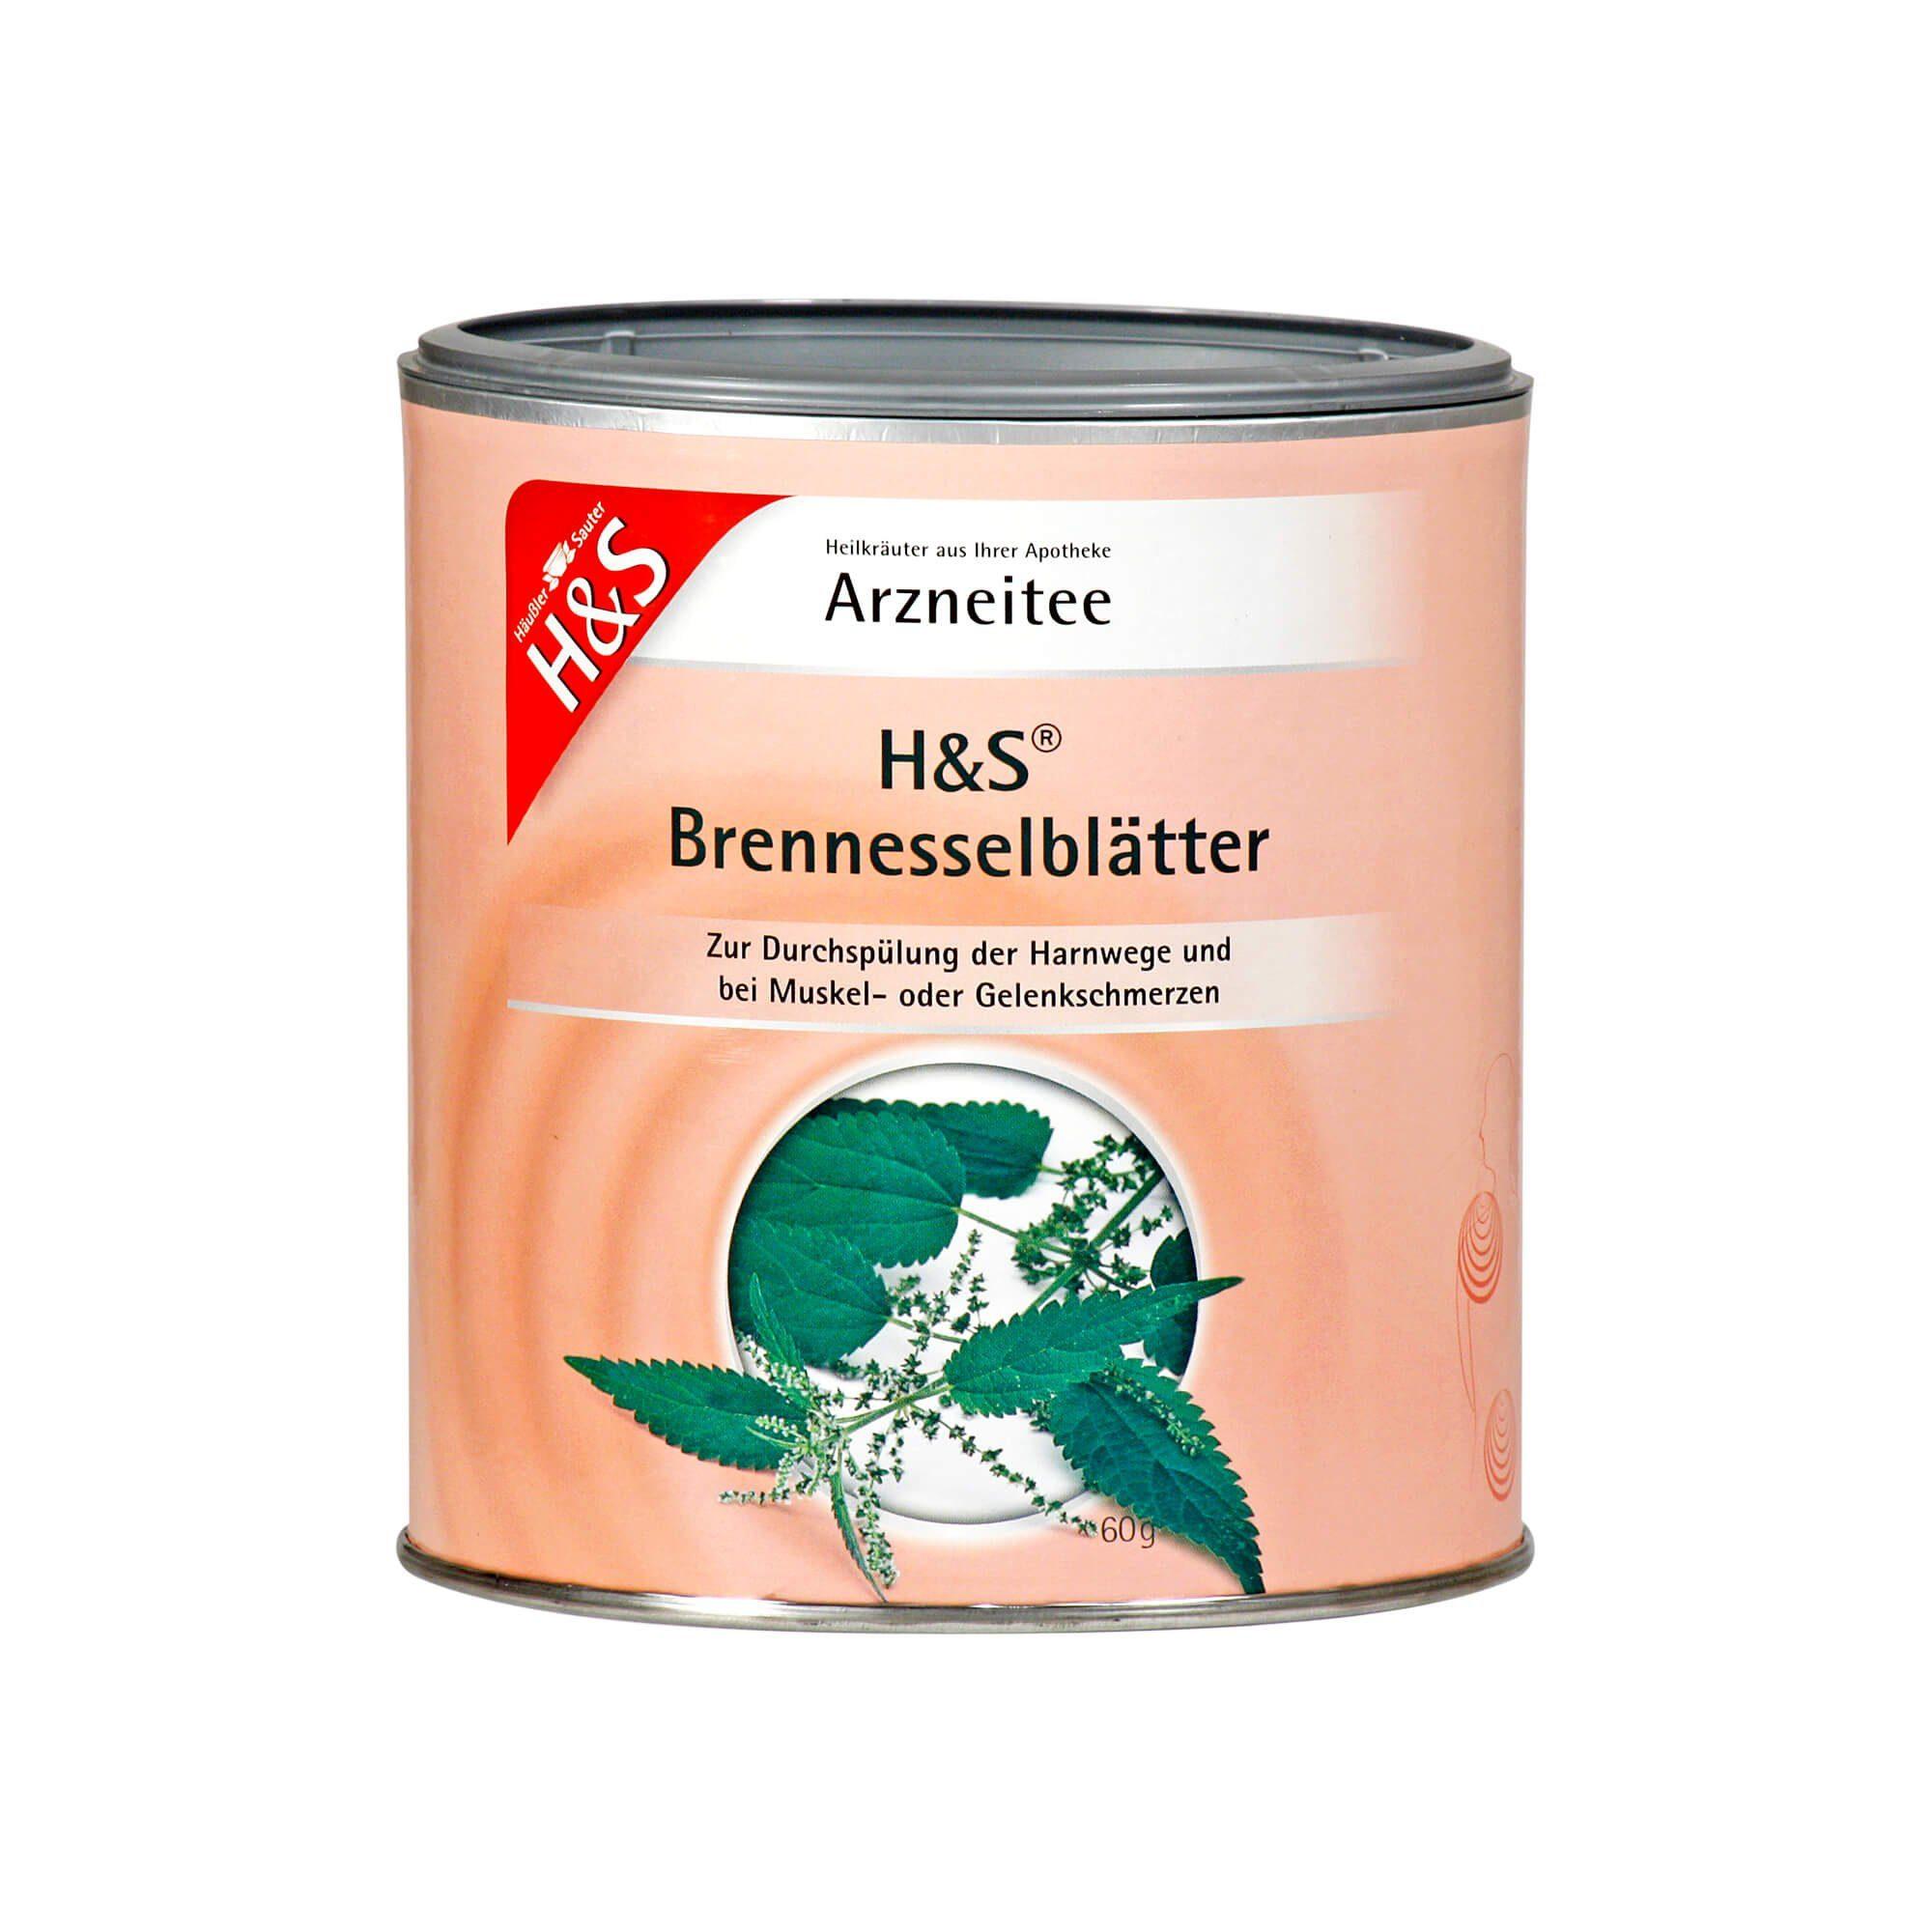 H&S Brennesselblätter Loser Tee (, 60 g)